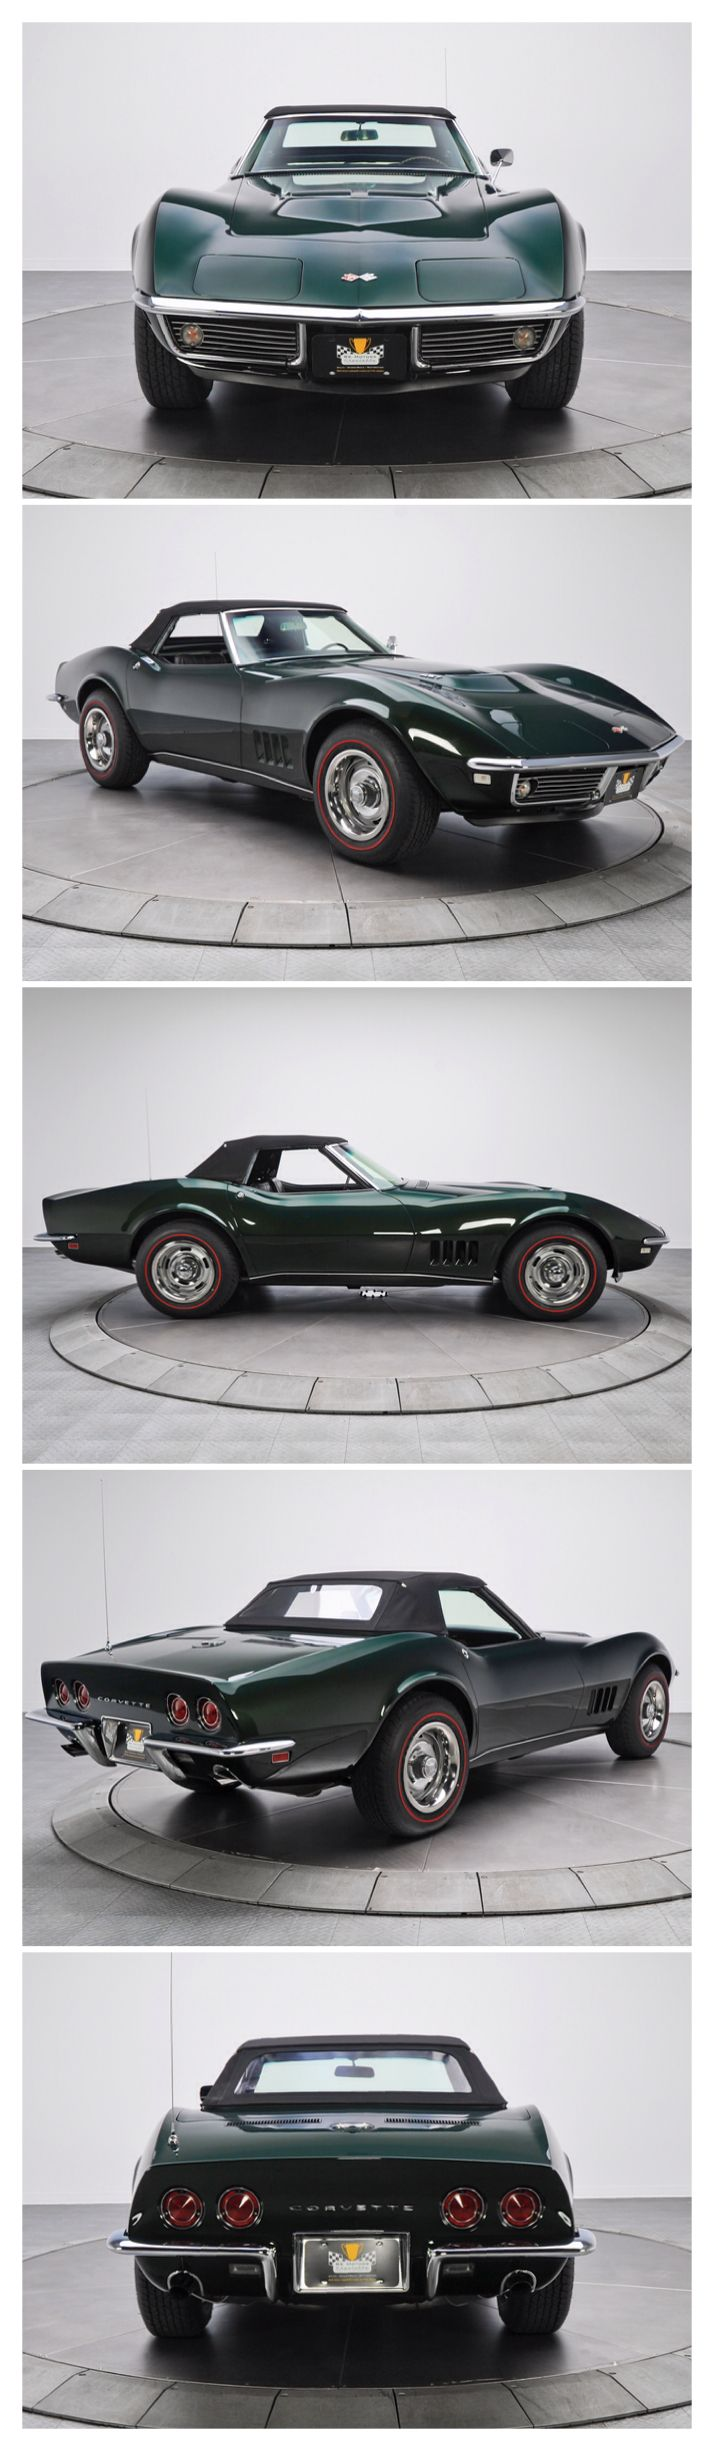 1968 Chevy Corvette Sting Ray 427